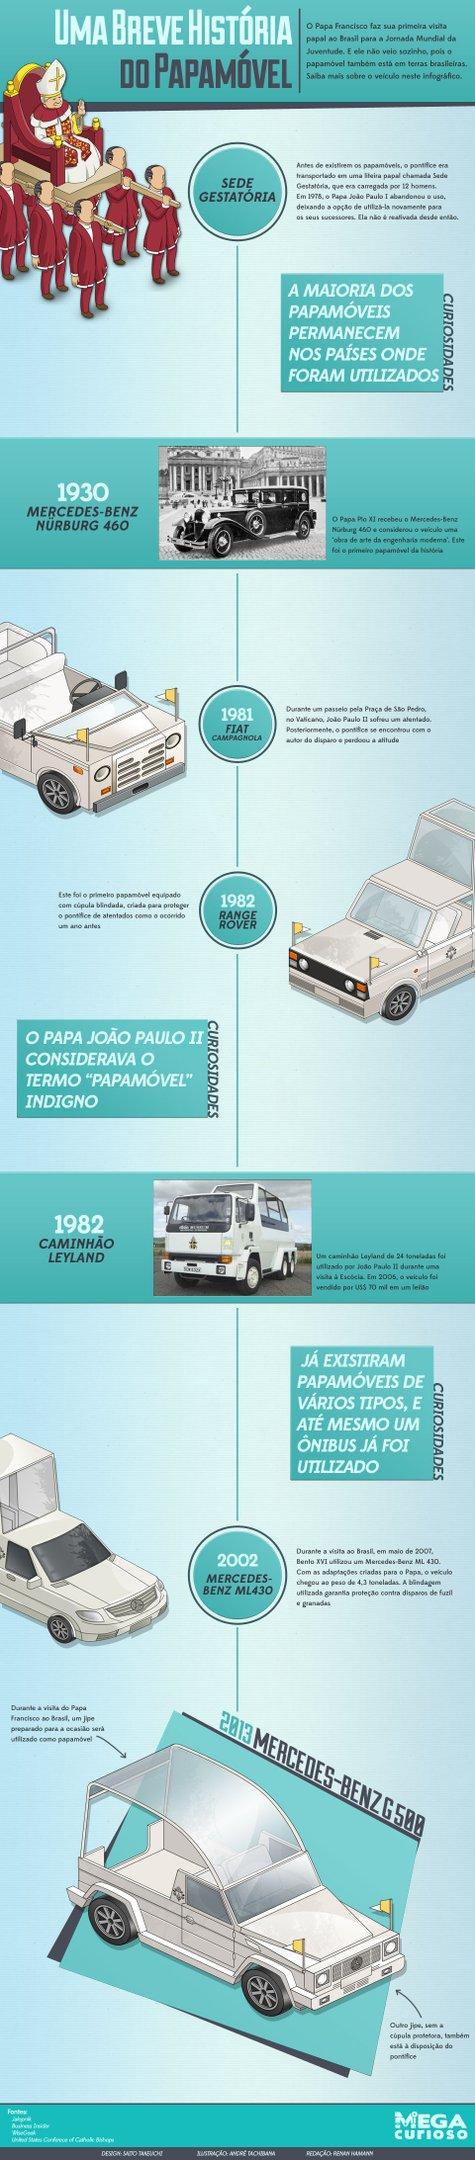 Papamóvel: o carro do pontífice [infográfico]